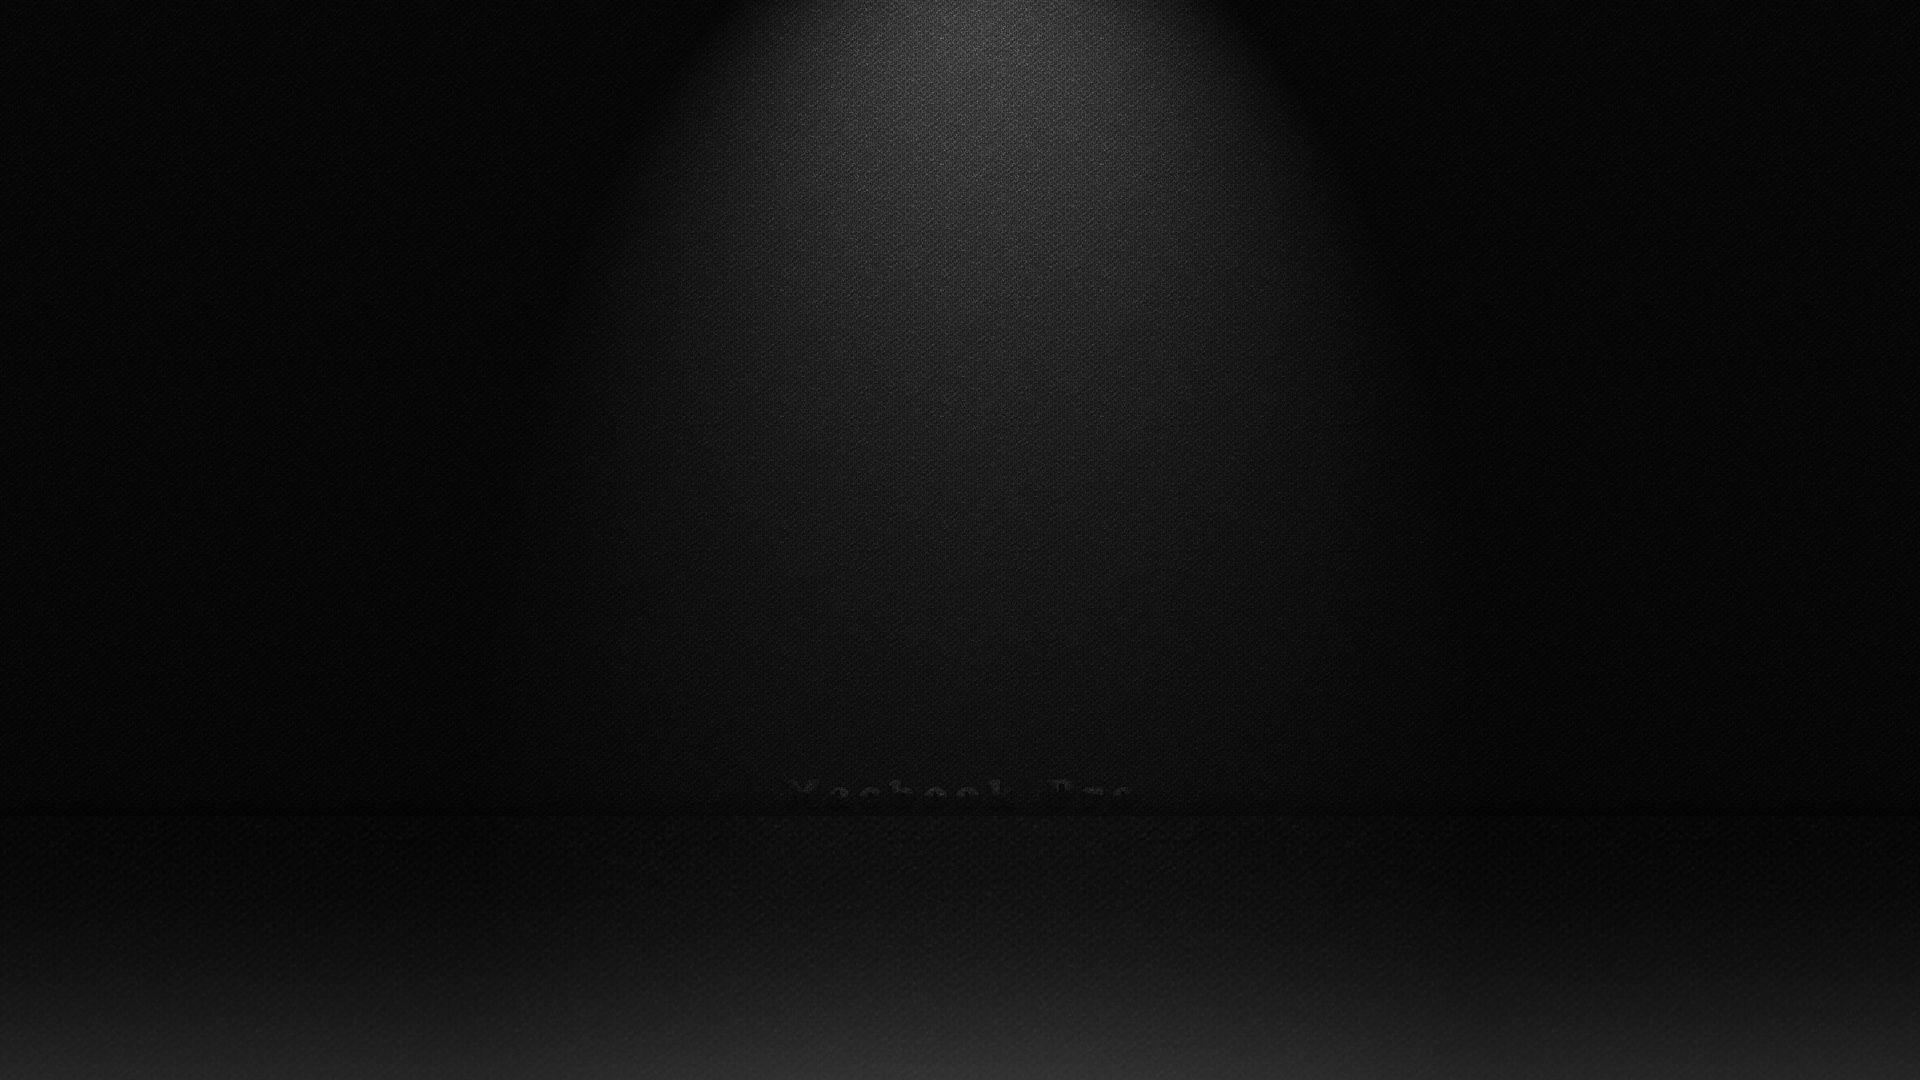 Macbook Pro Wallpapers Hd Darkness 51629 Hd Wallpaper